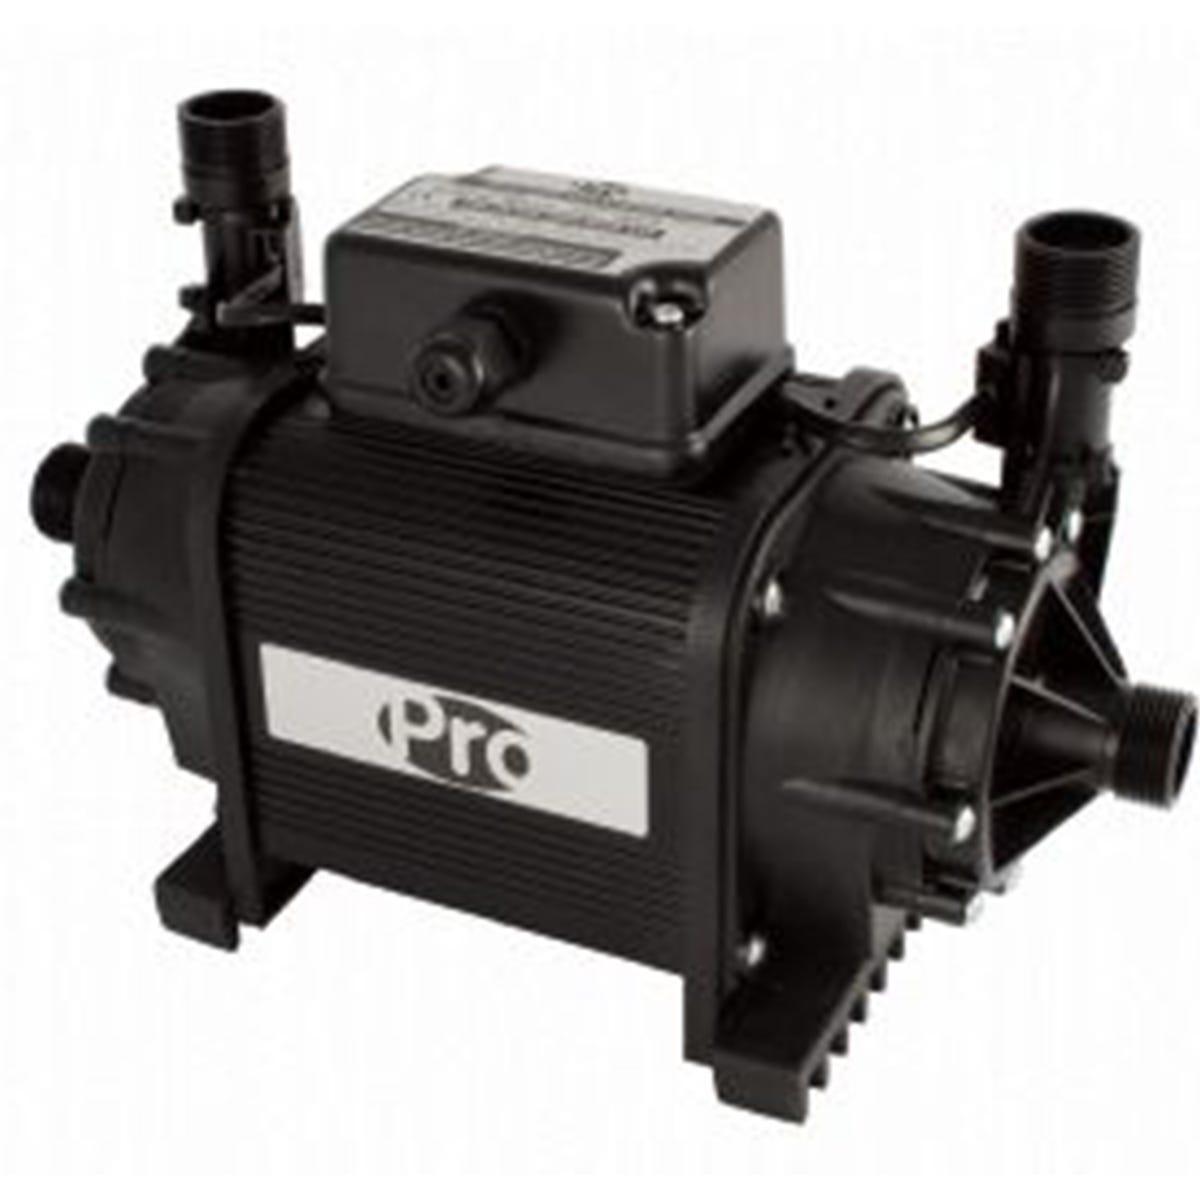 Pro 2.0 Bar Twin Impeller Centrifugal Shower Pump